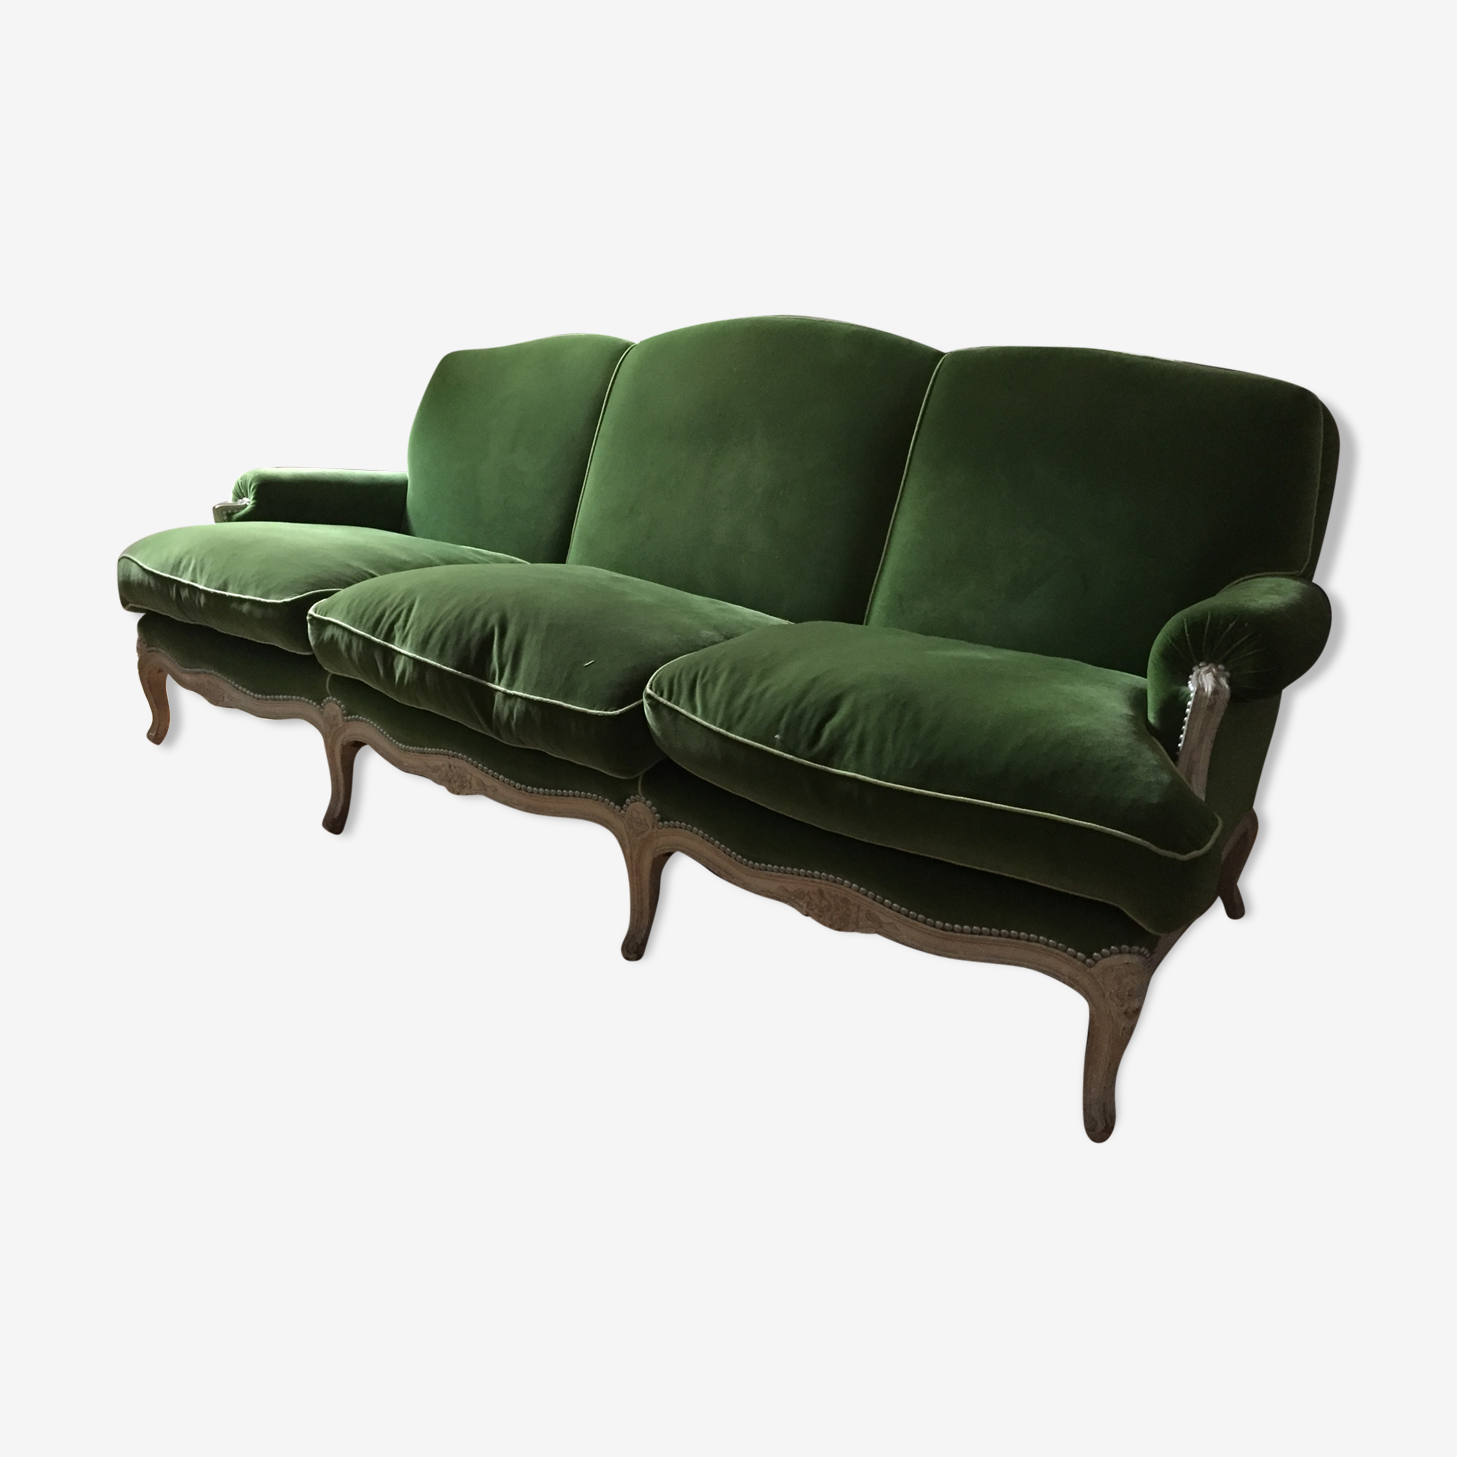 Canapé style Louis XV vert pomme